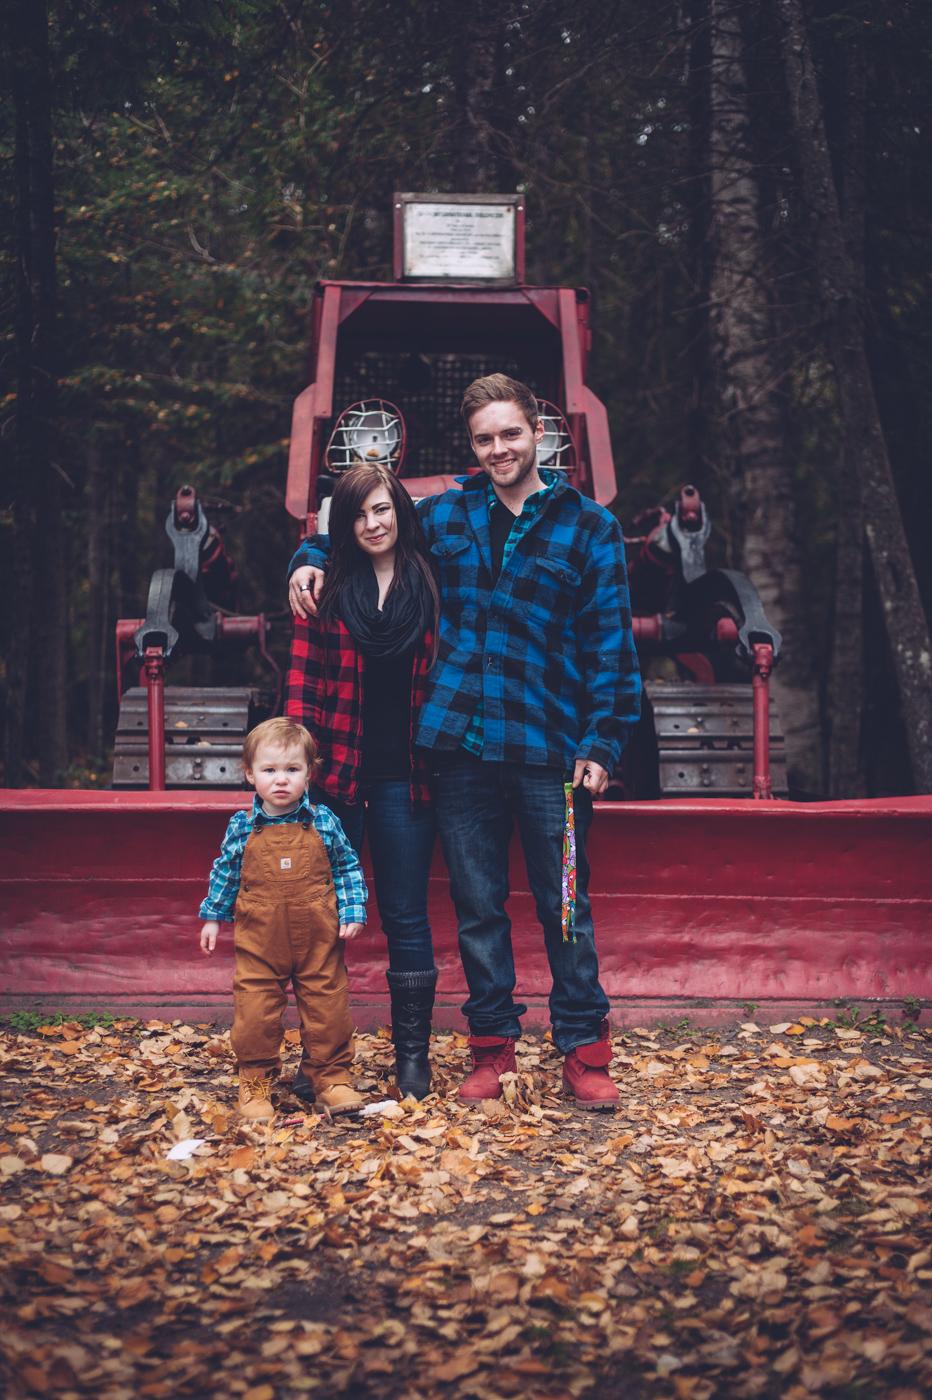 carol_family_portraits_blog16.jpg